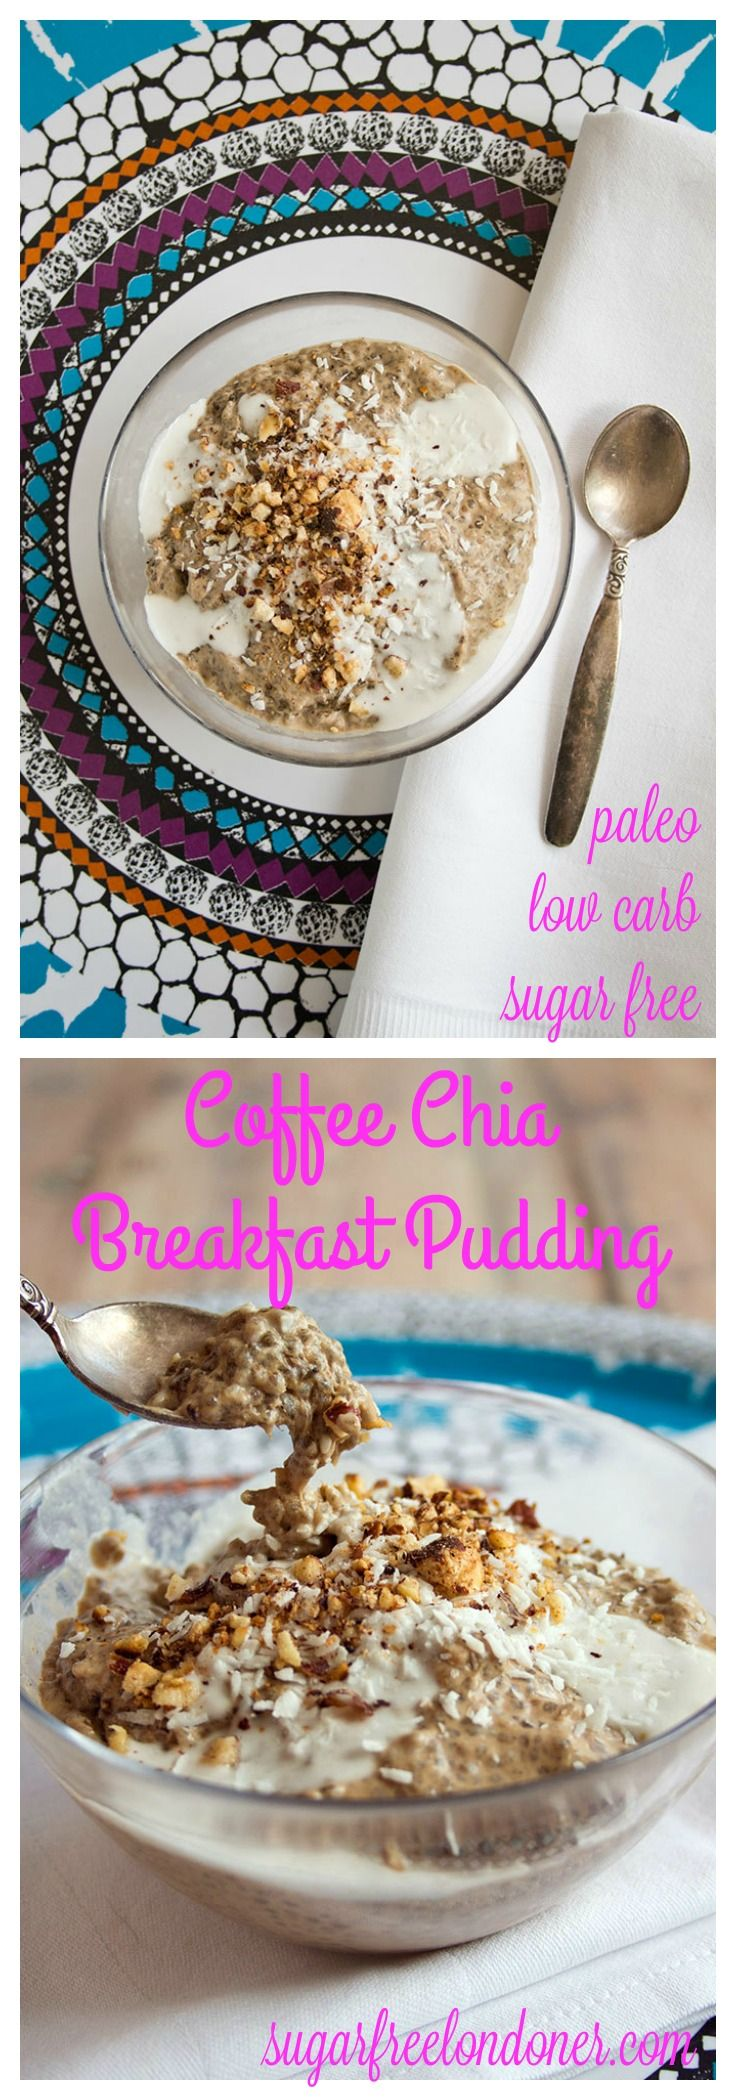 Coffee Chia Breakfast Pudding